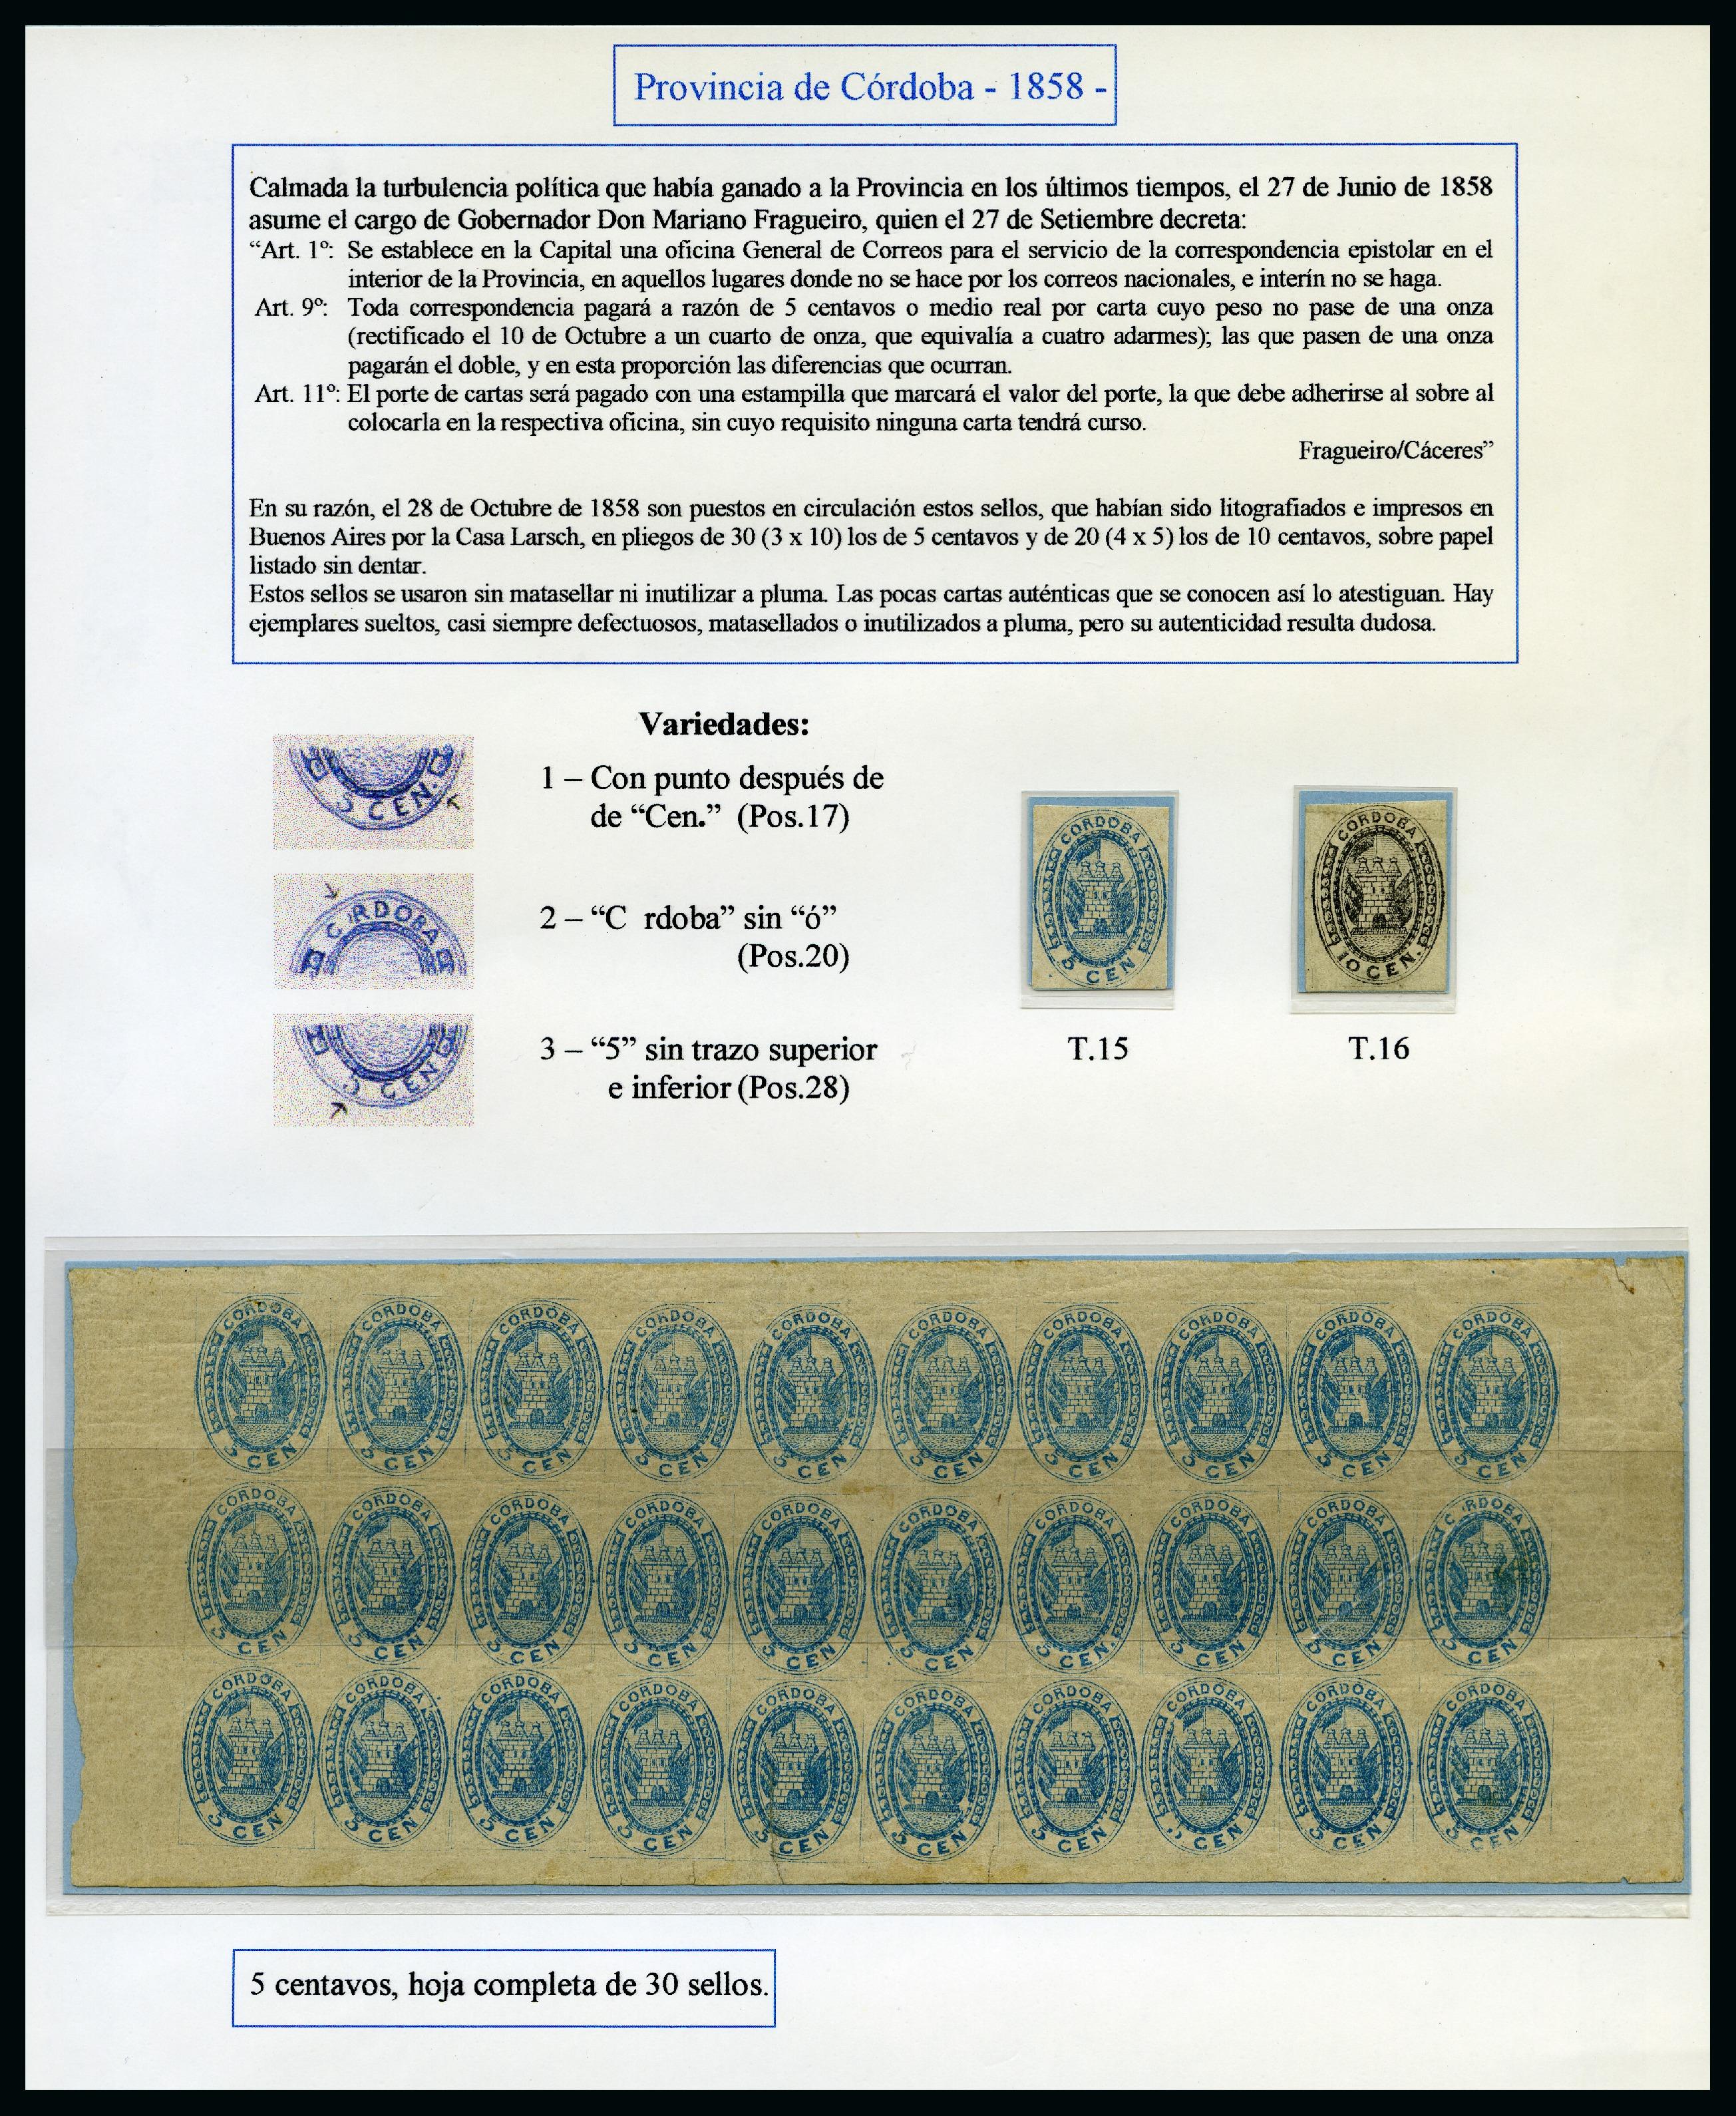 Lot 53009 - Argentina » Cordoba  -  David Feldman S.A. Overseas & Switzerland | Autumn Auction Series day 5